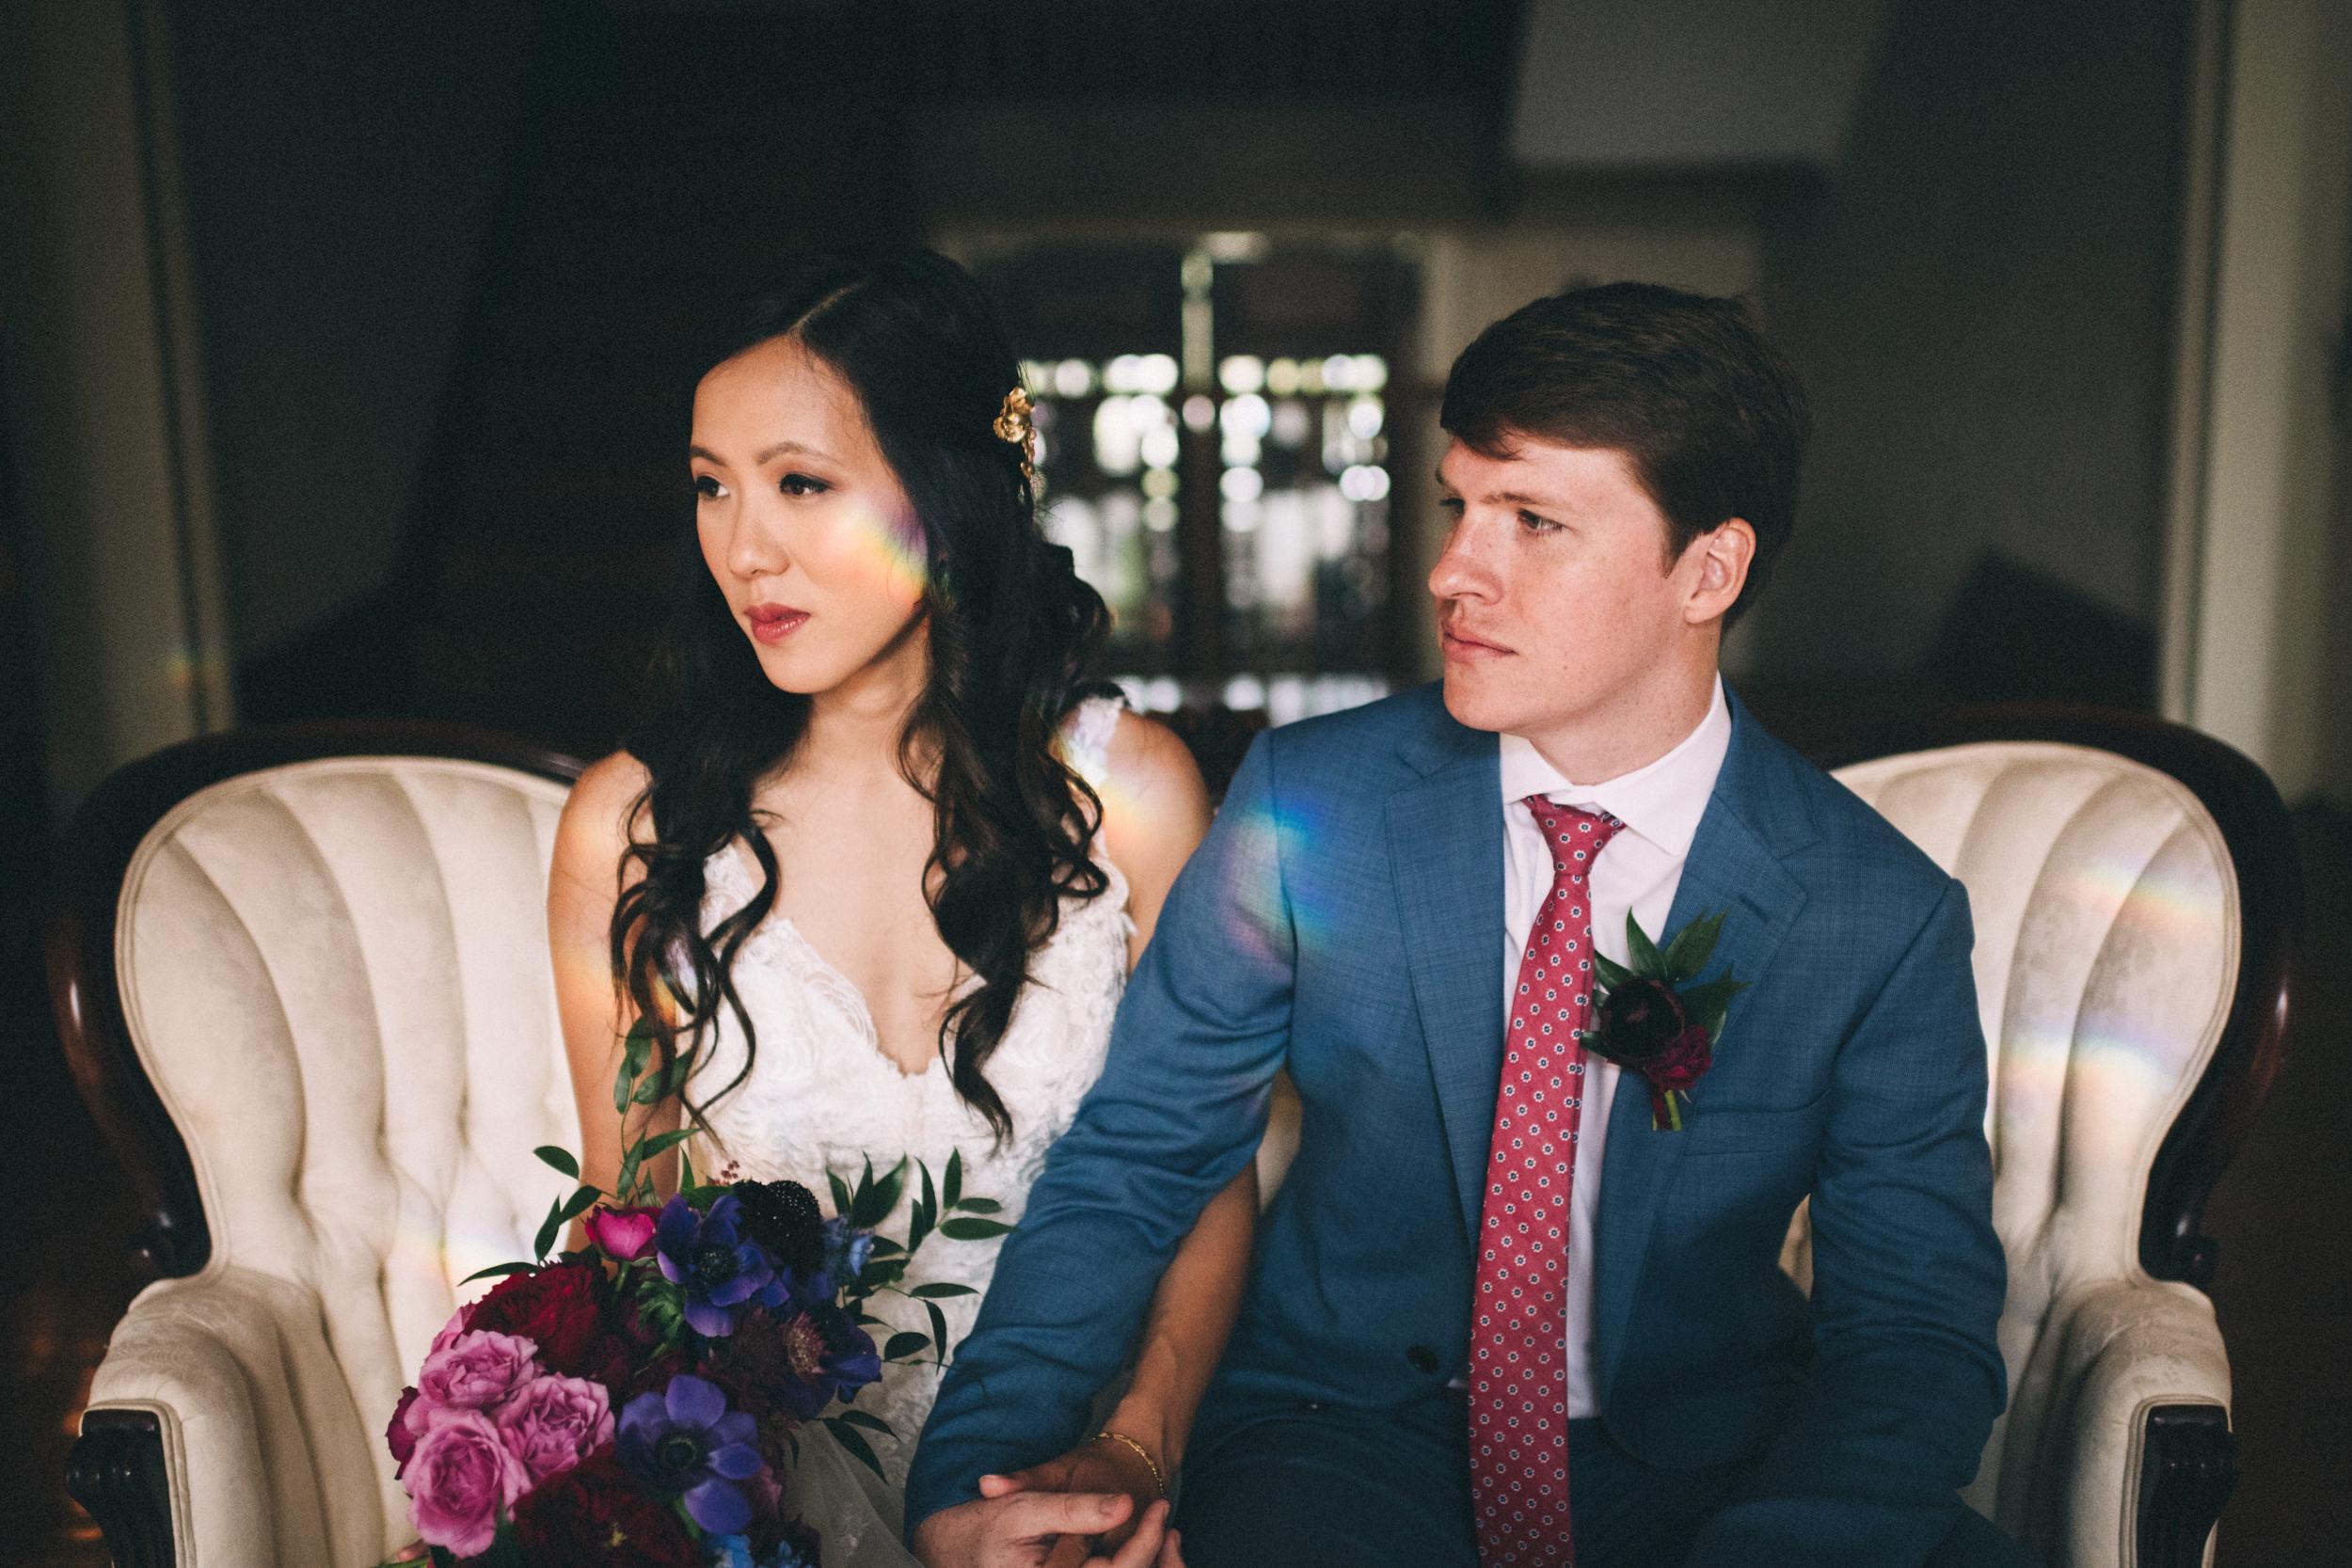 Louisville-Kentucky-Wedding-and-Elopement-Photographer-Sarah-Katherine-Davis-Photography-Summer-Jewel-Toned-Wedding-Chineese-Tea-Ceremony-Warrenwood-Manor-Danville-387.jpg